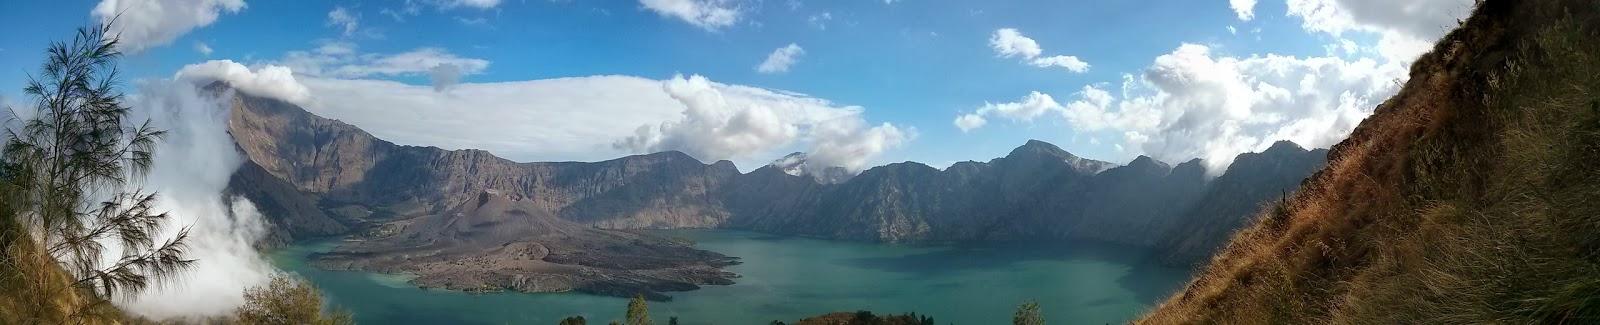 danau segara anak lombok how to get there